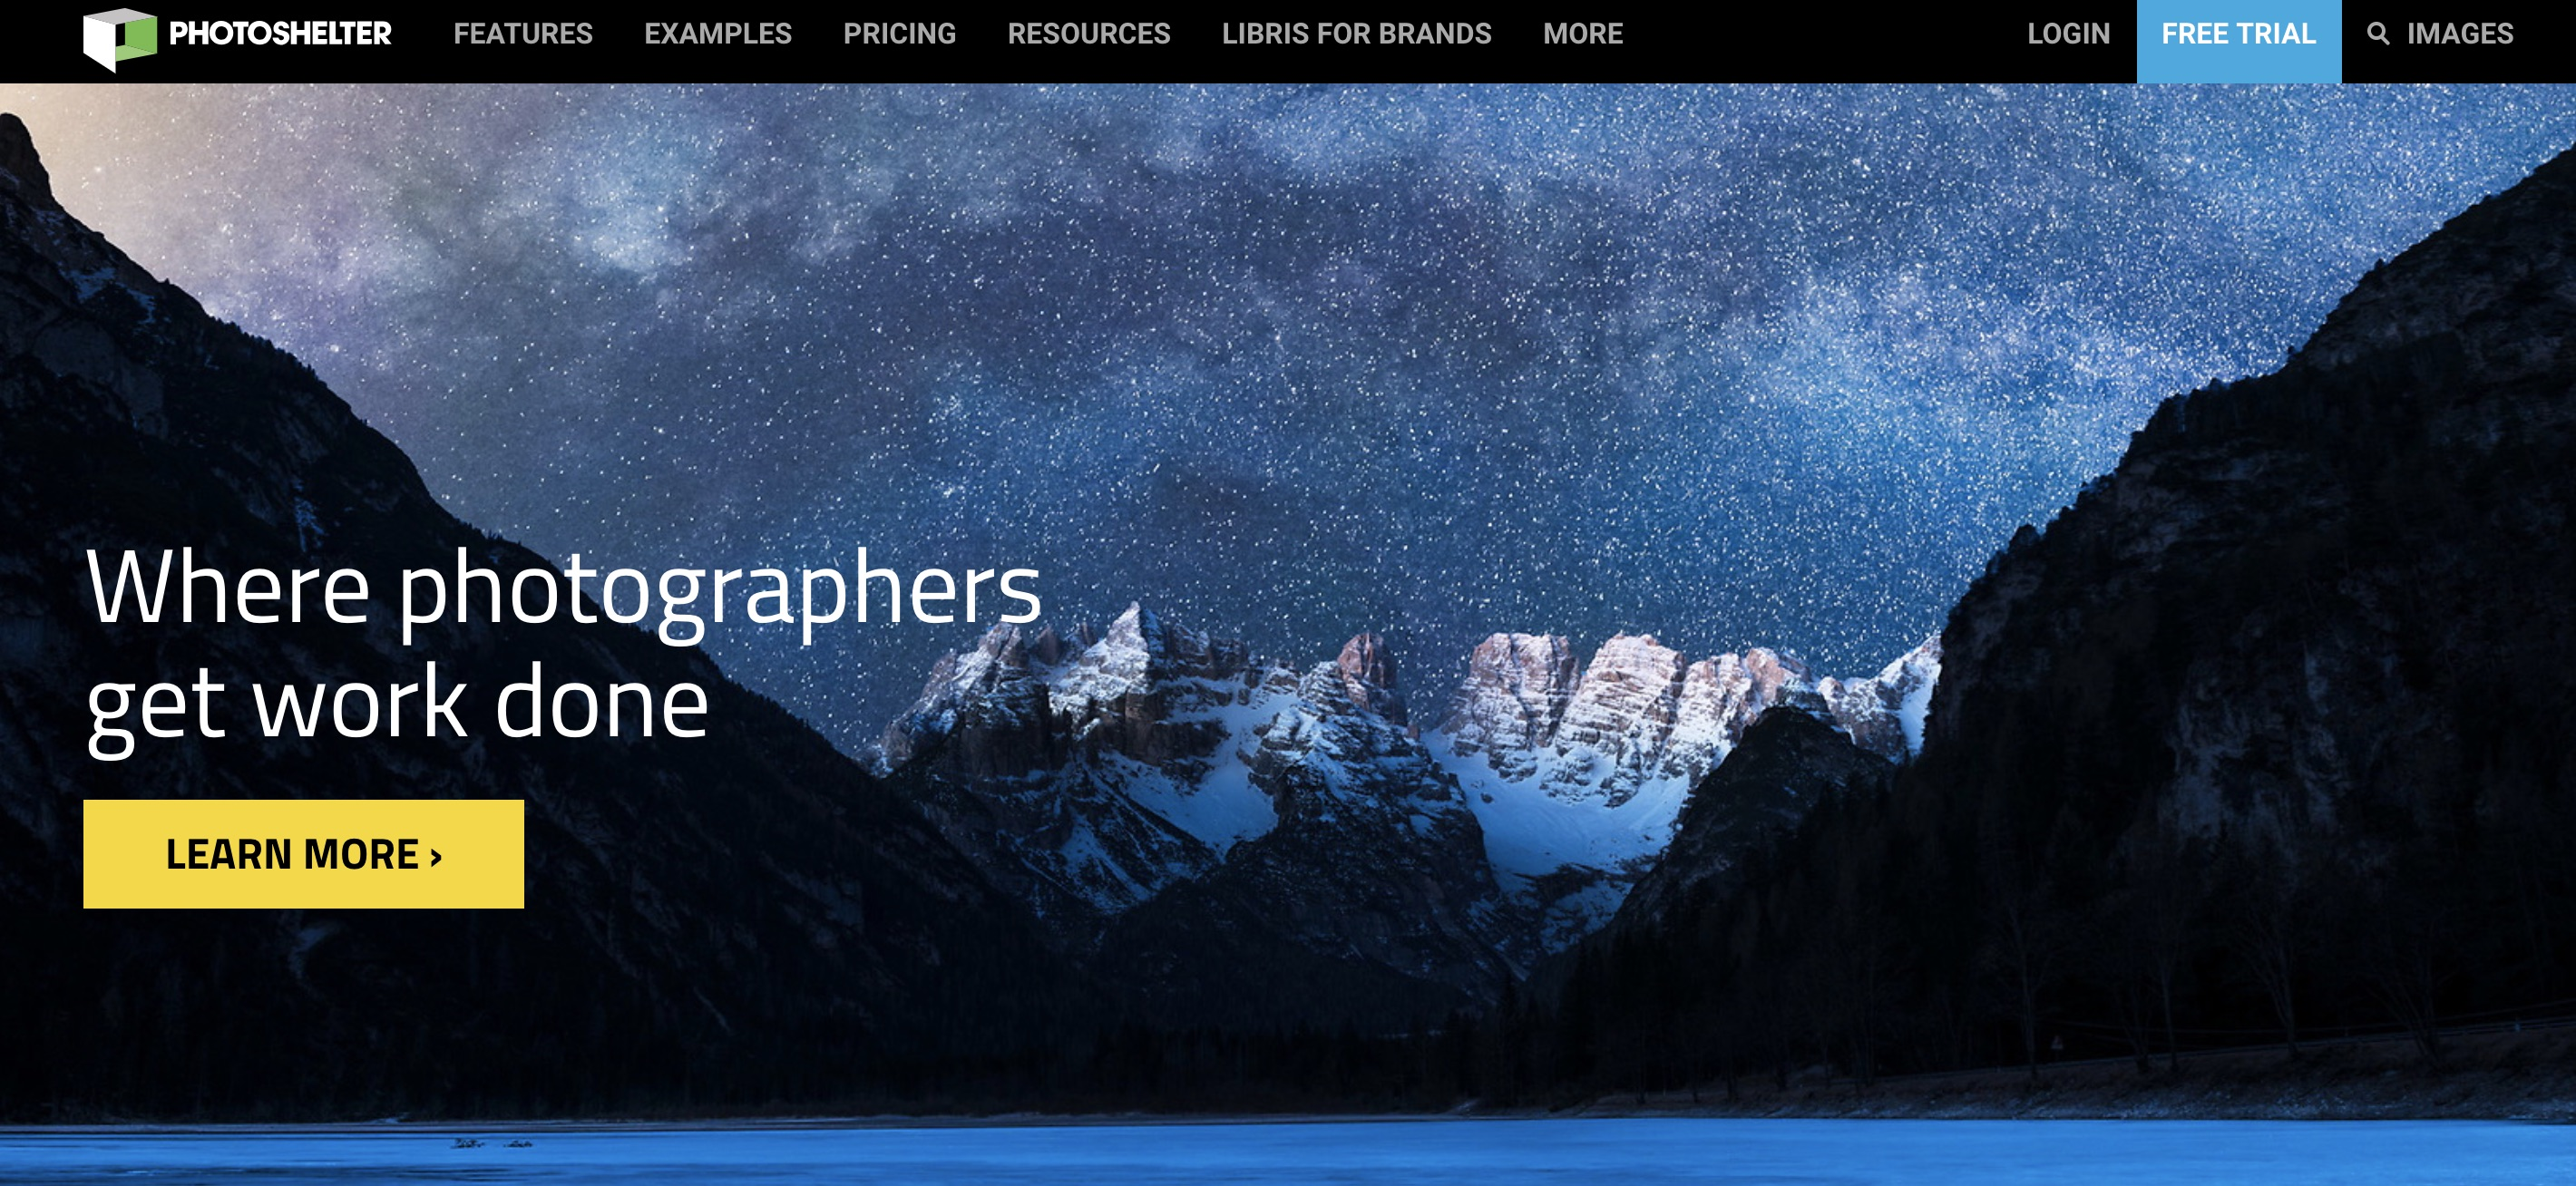 Web Hosting For Photographers | Web Hosting Sun